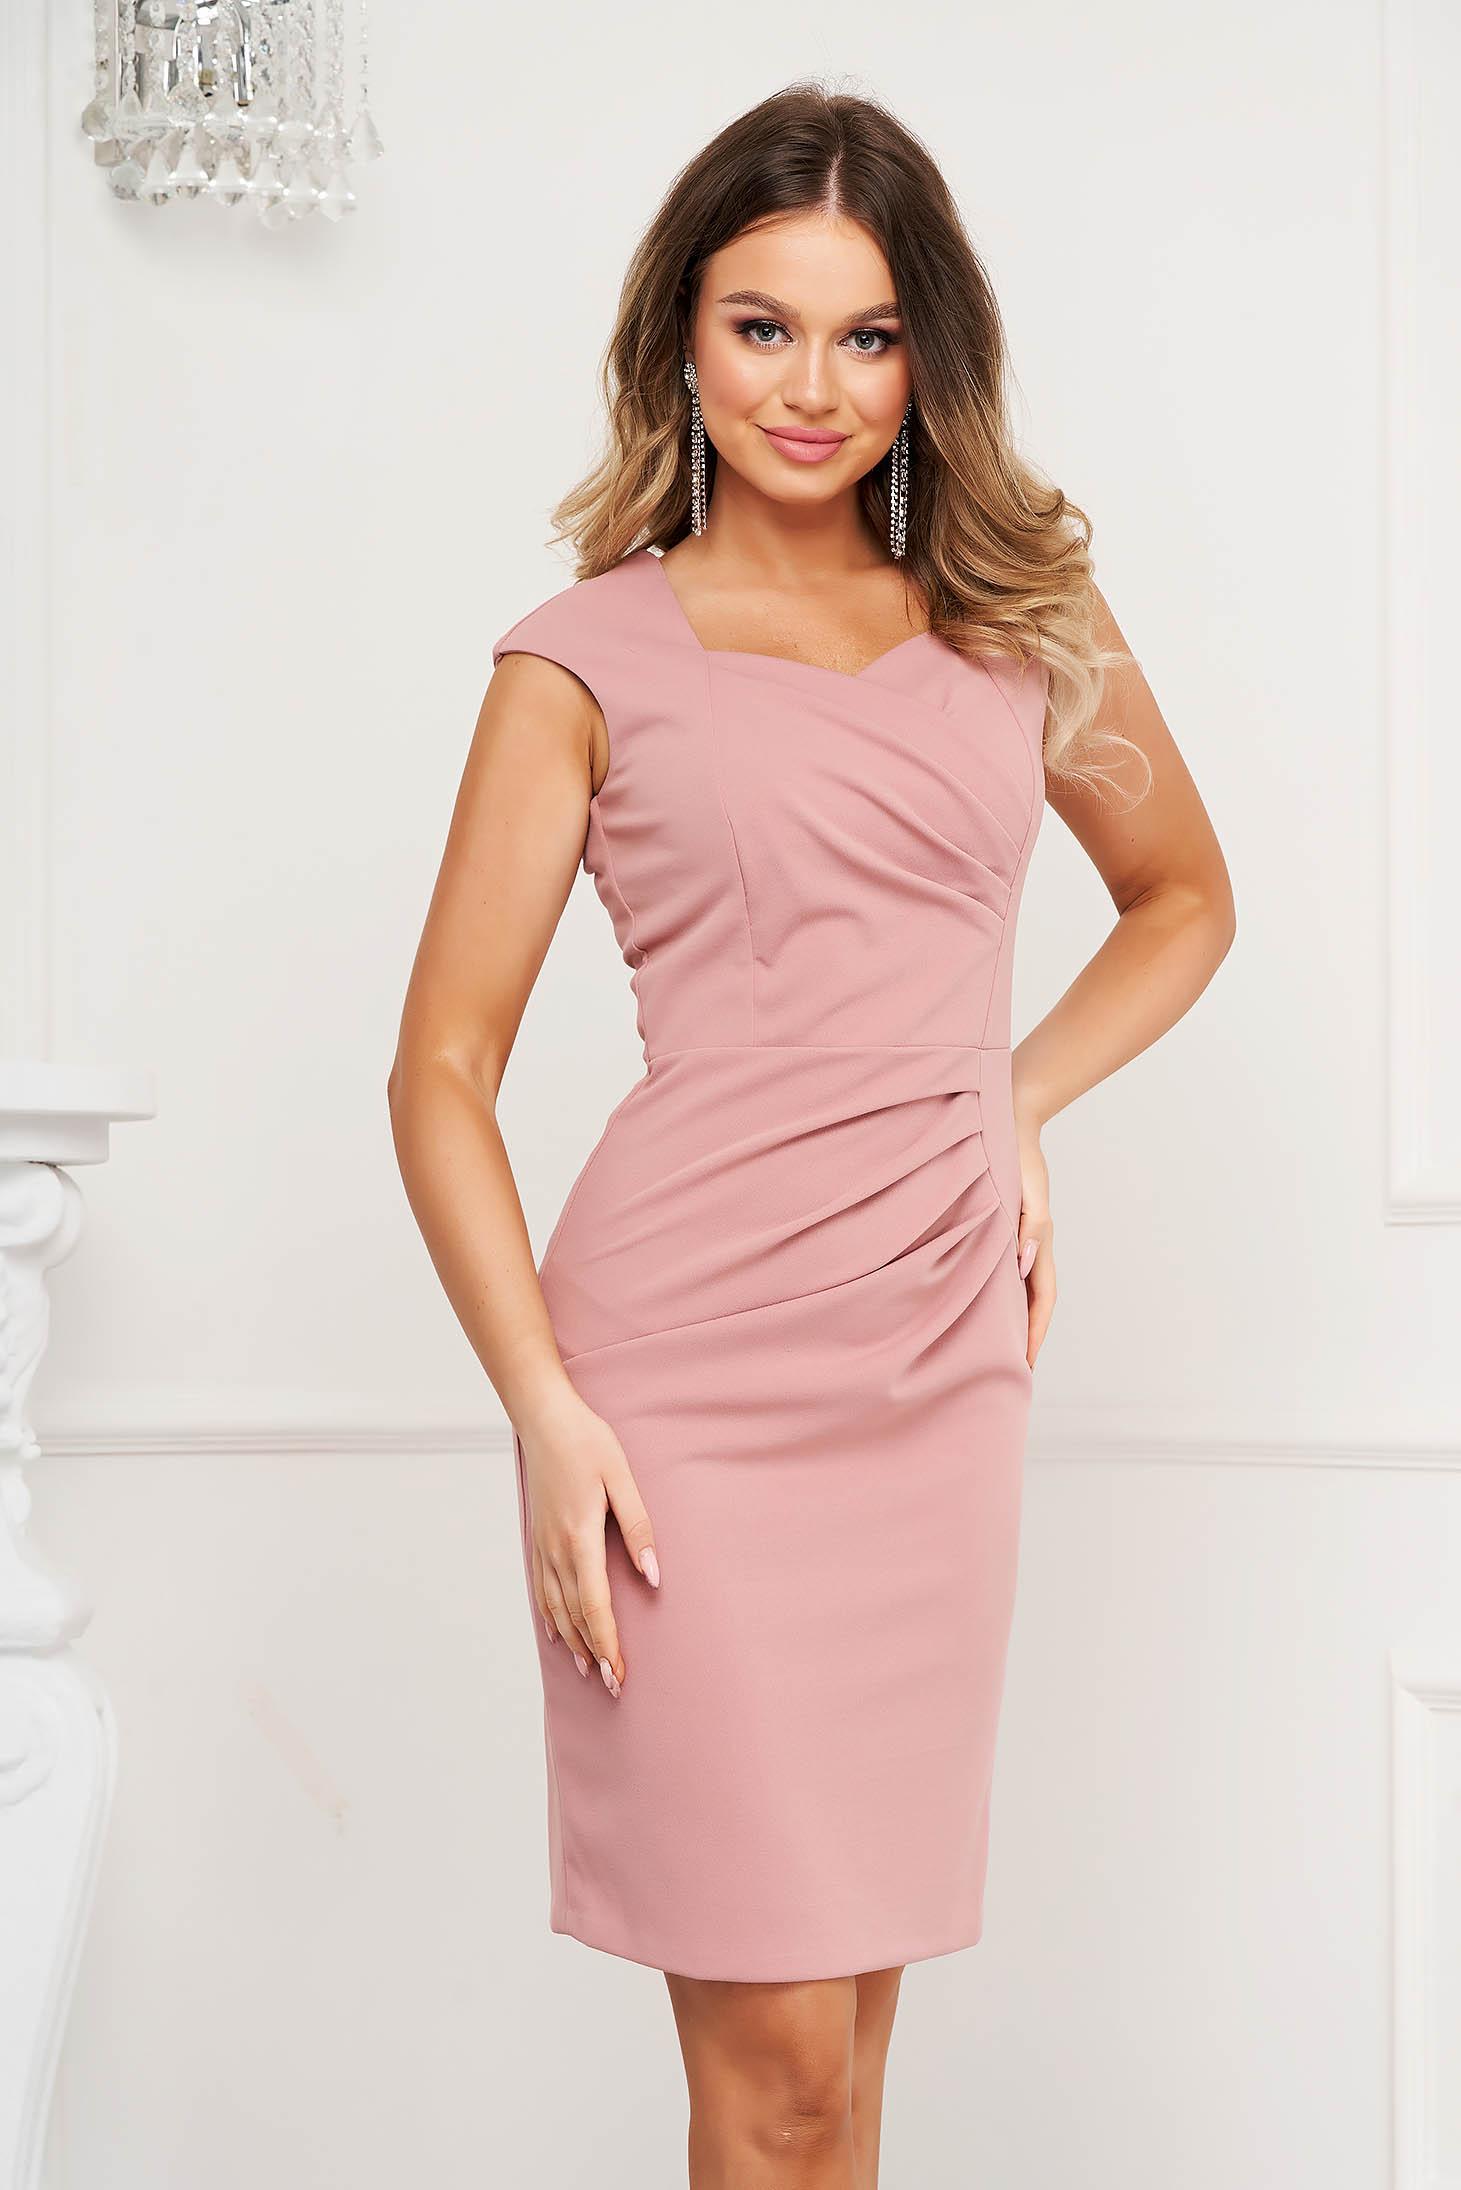 Rochie roz de ocazie scurta tip creion din material usor incretit in talie